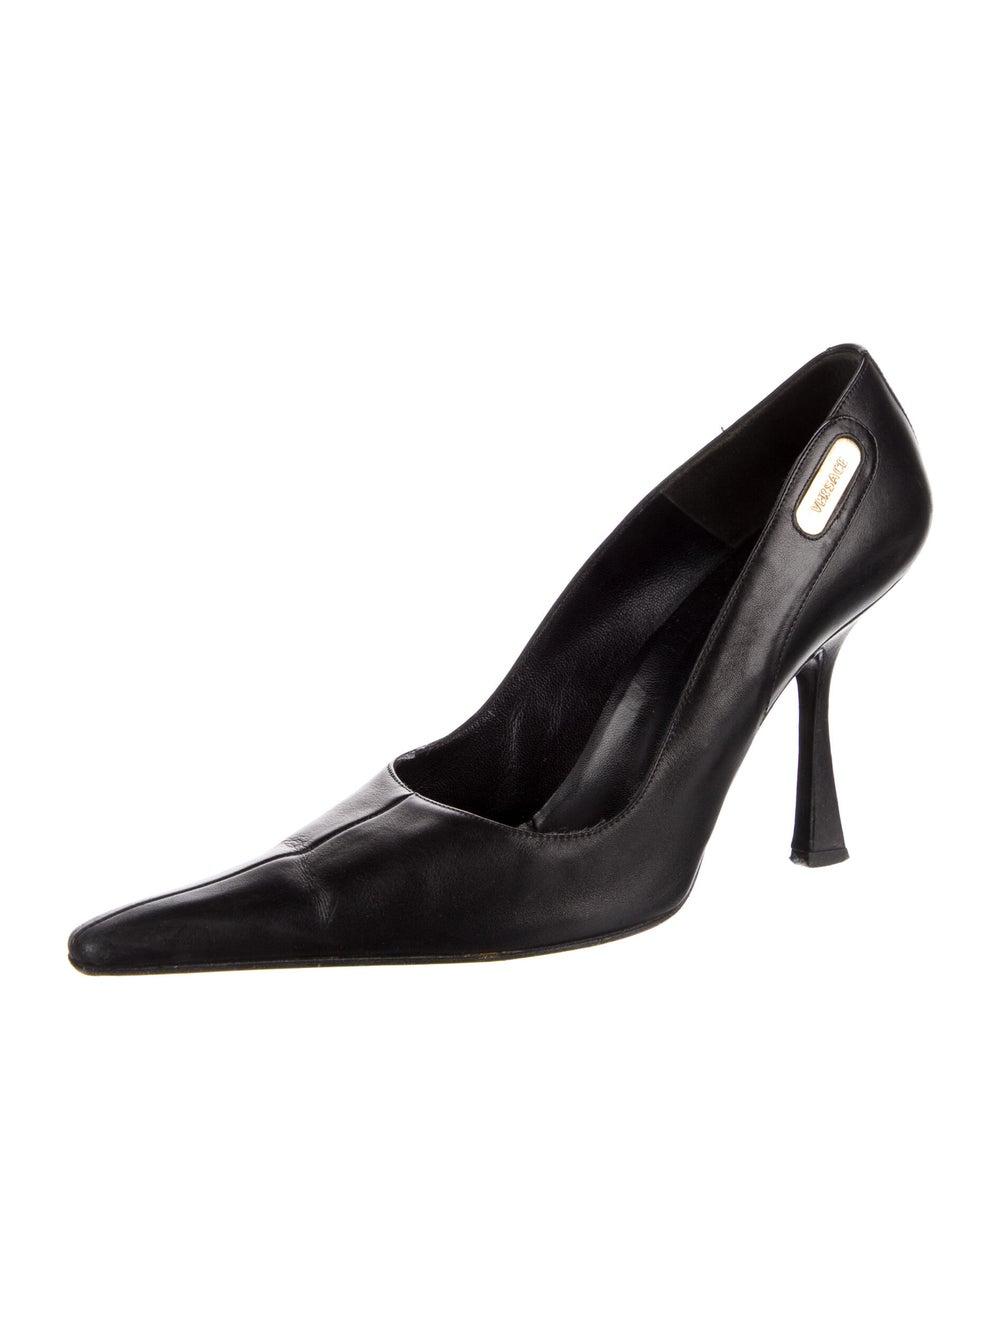 Gianni Versace Leather Pumps Black - image 2